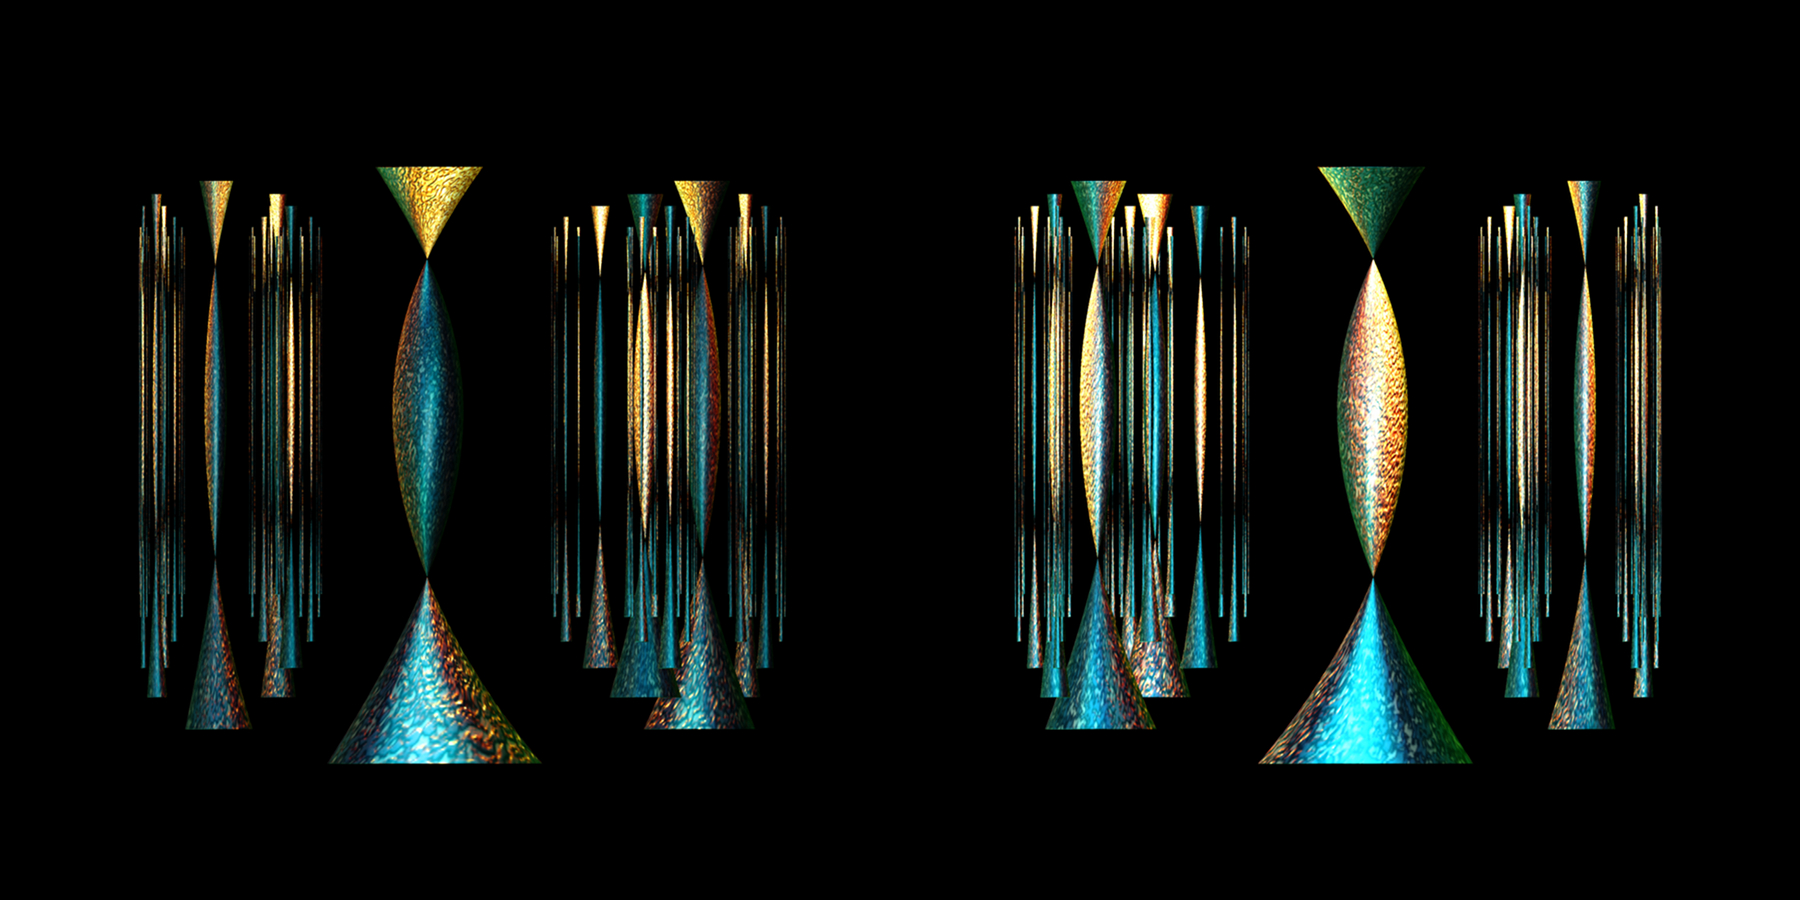 "The Hollow Men I 24""x12"" Dye Sublimation on Aluminum Copyright 2016 Wm. J. Lee"